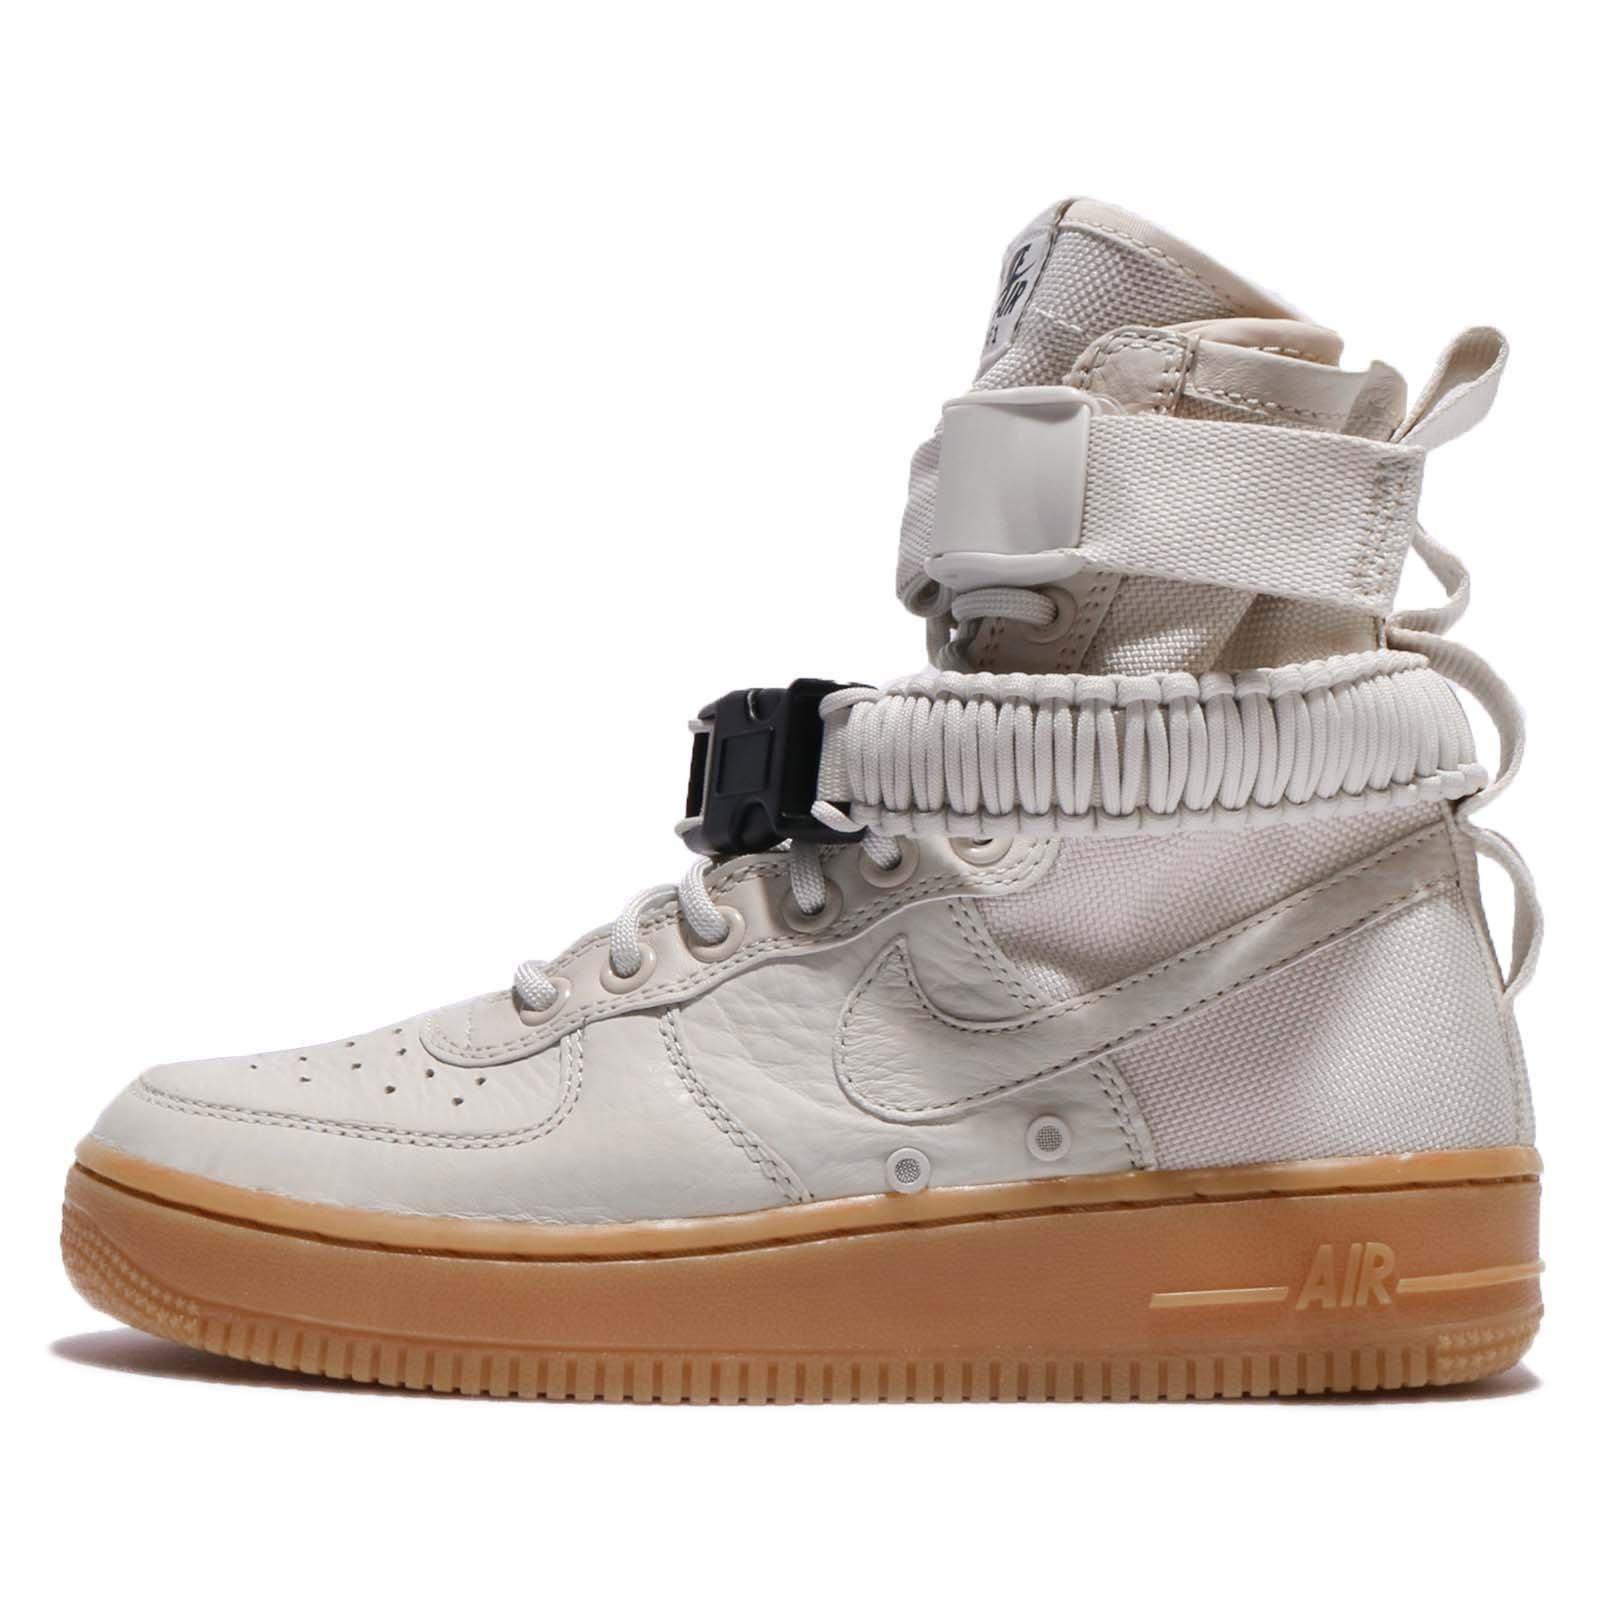 Nike SF Air Force 1 Womens Shoes Light